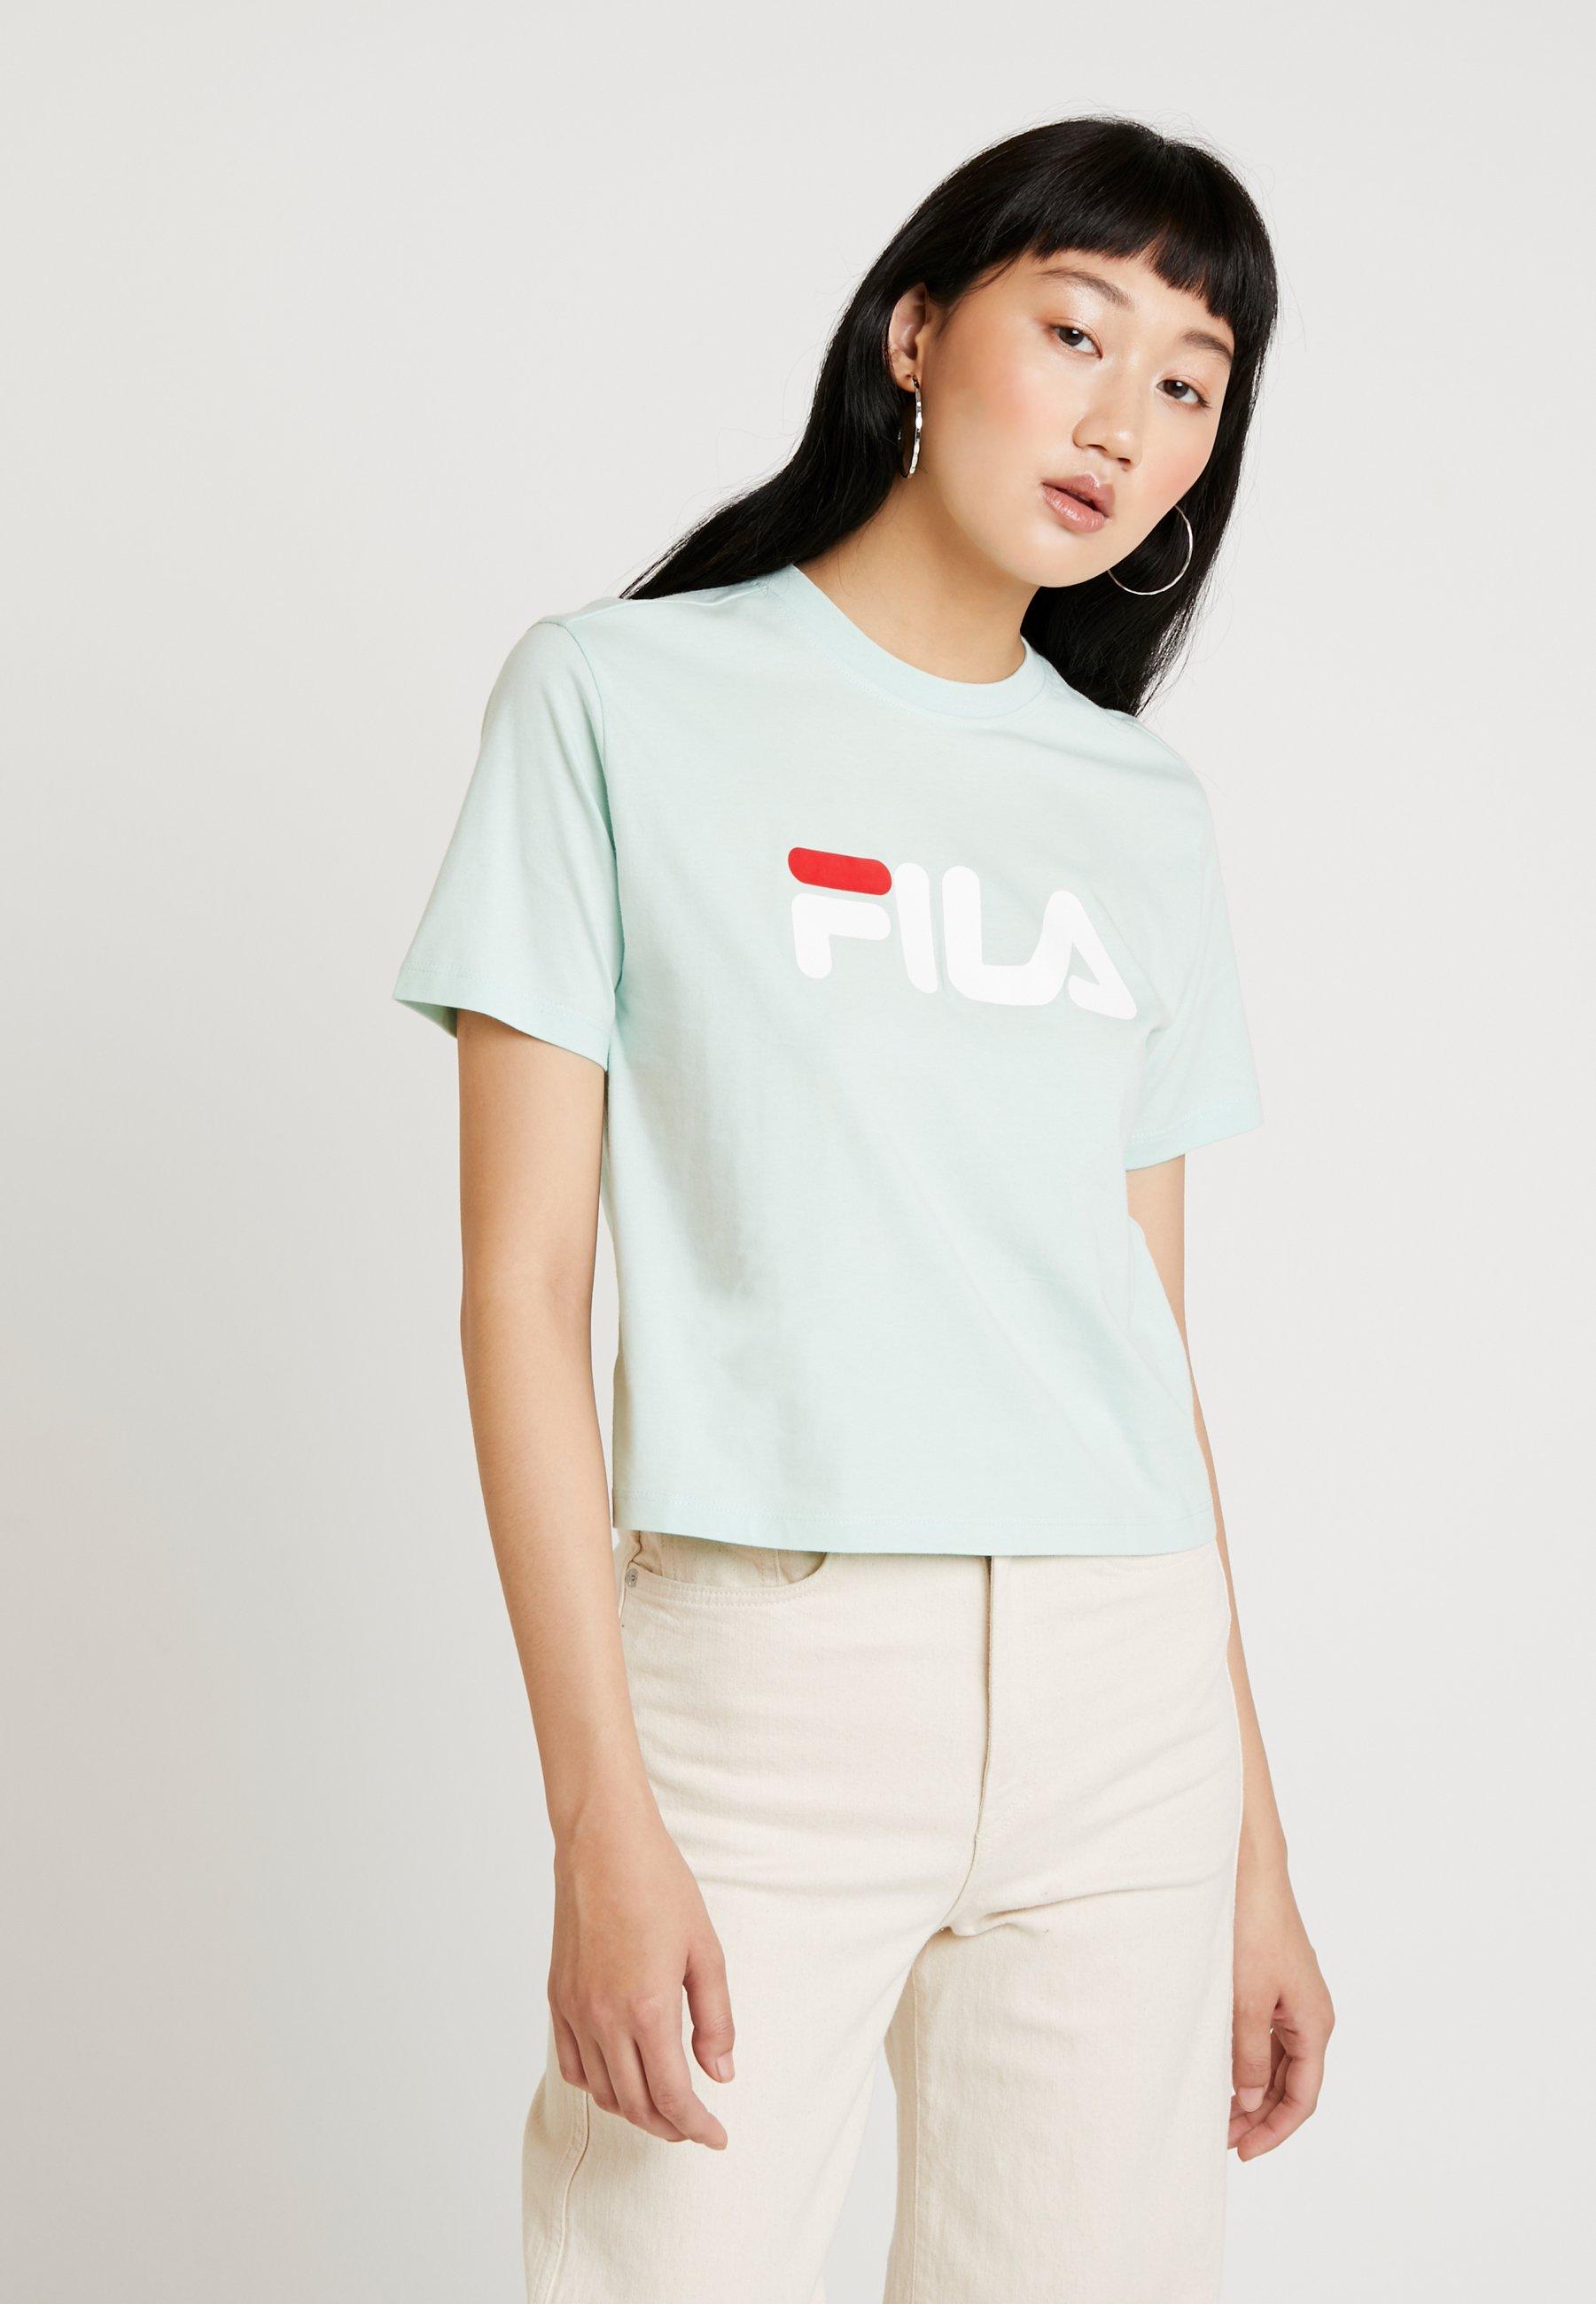 Fila shirt TeeT Imprimé Vivika Green Cropped Mist QCxerodBWE